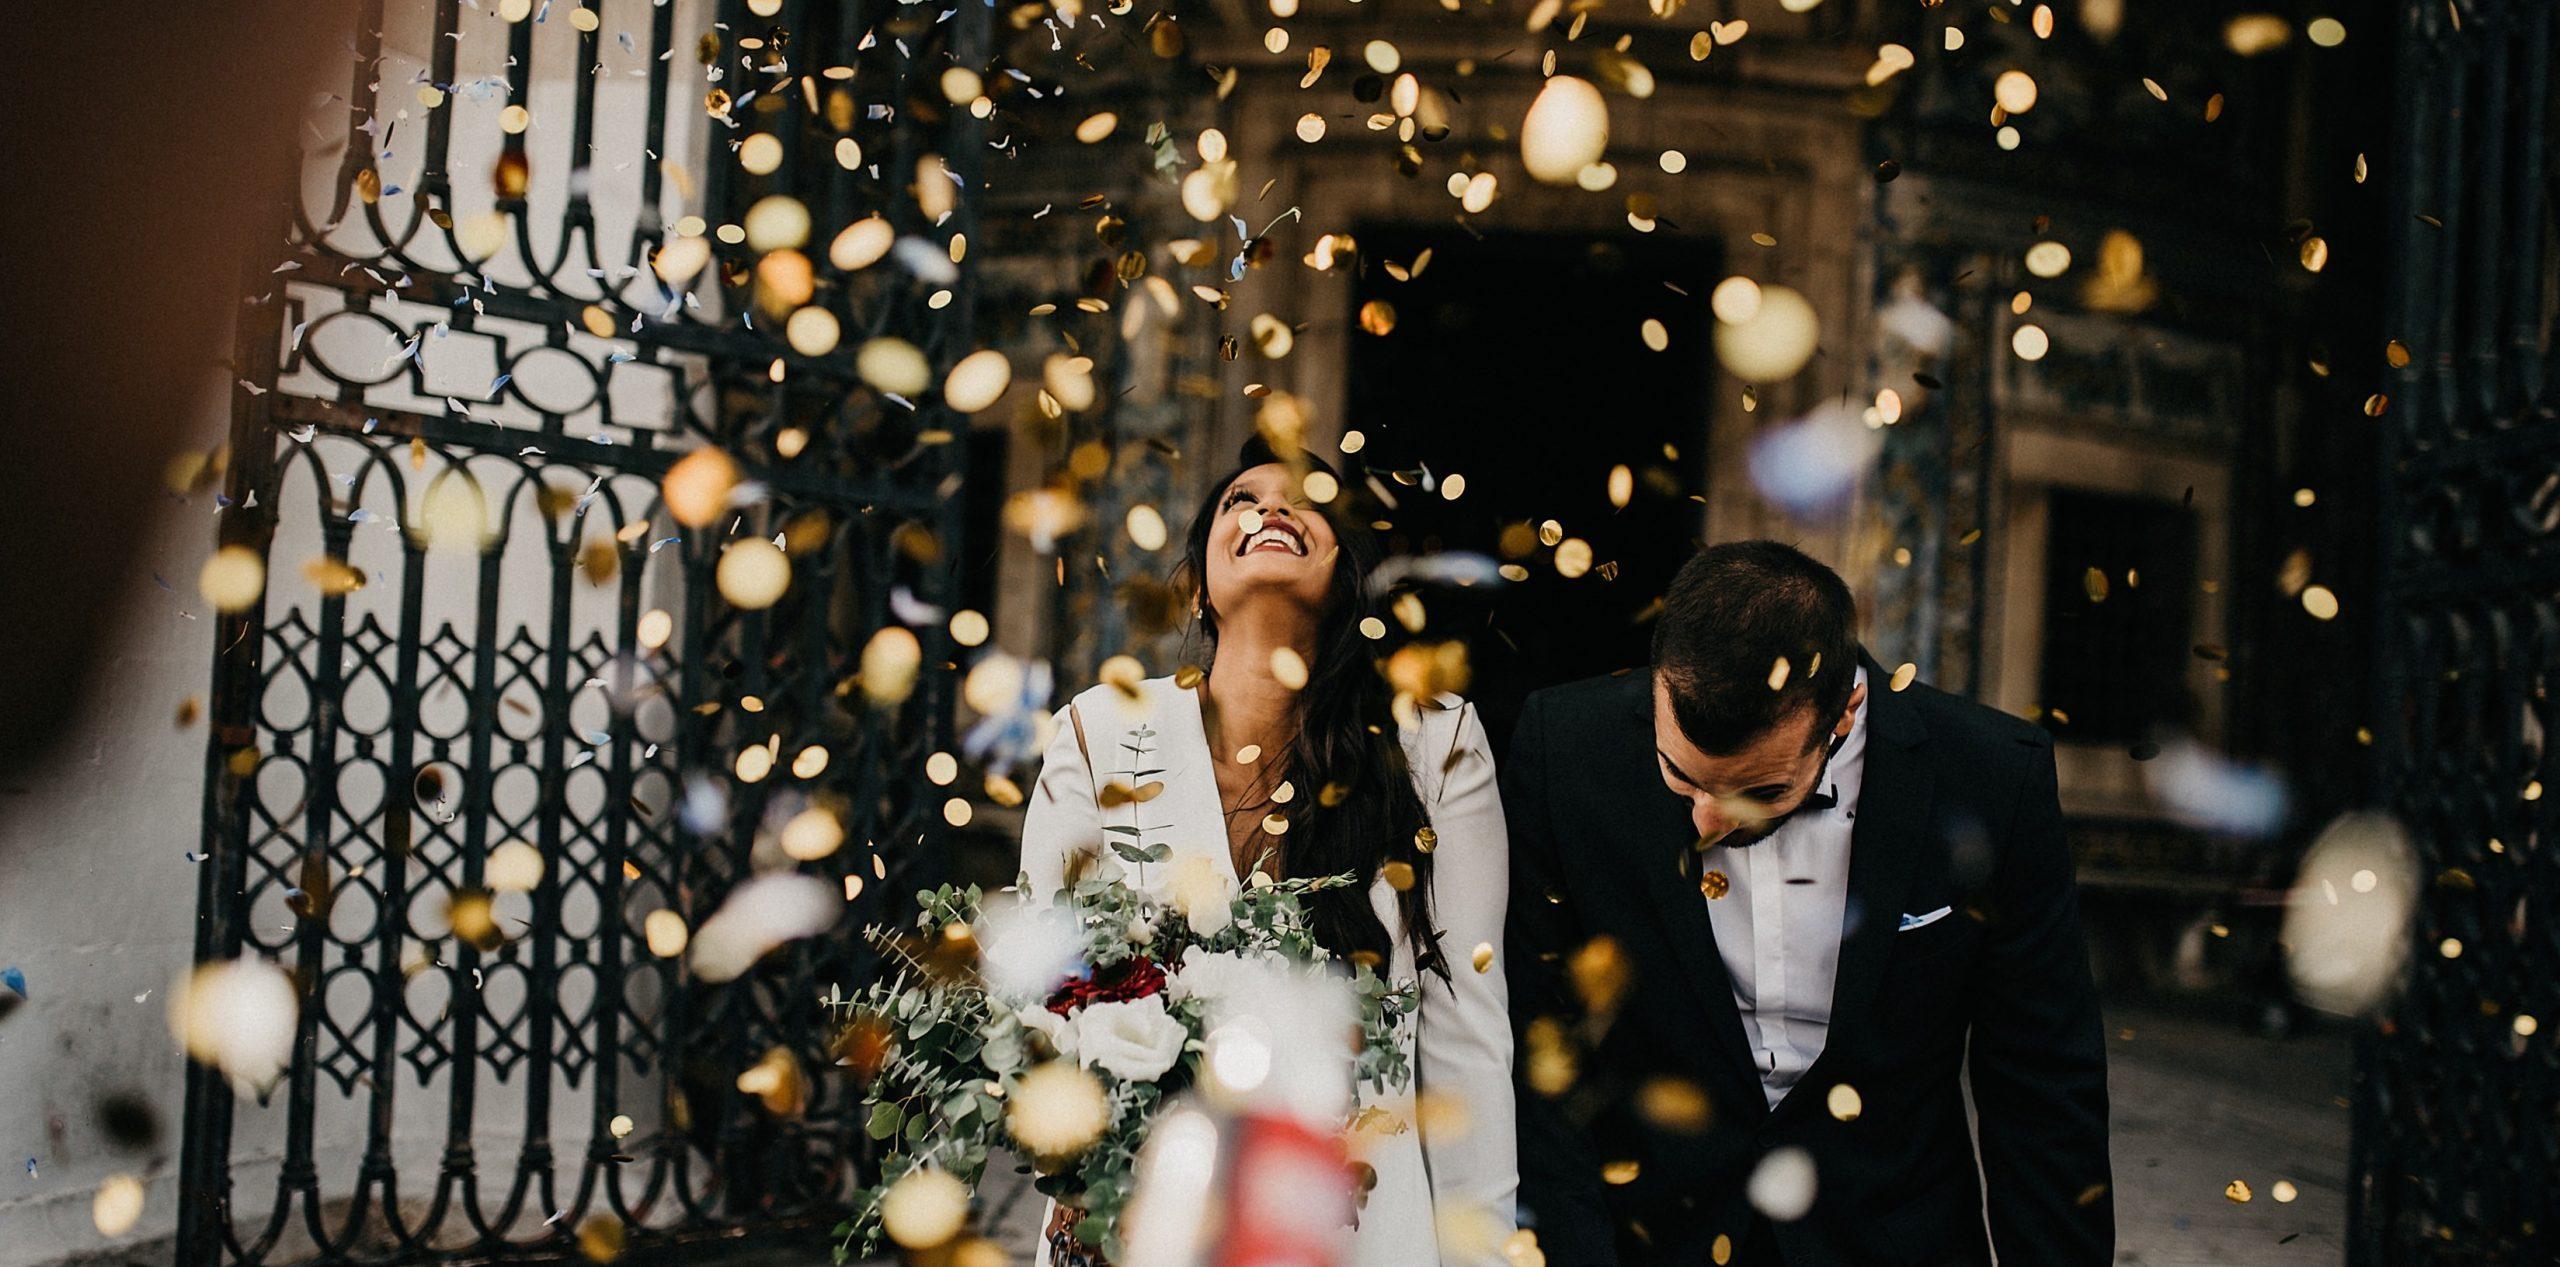 sud wedding lisbon the framers